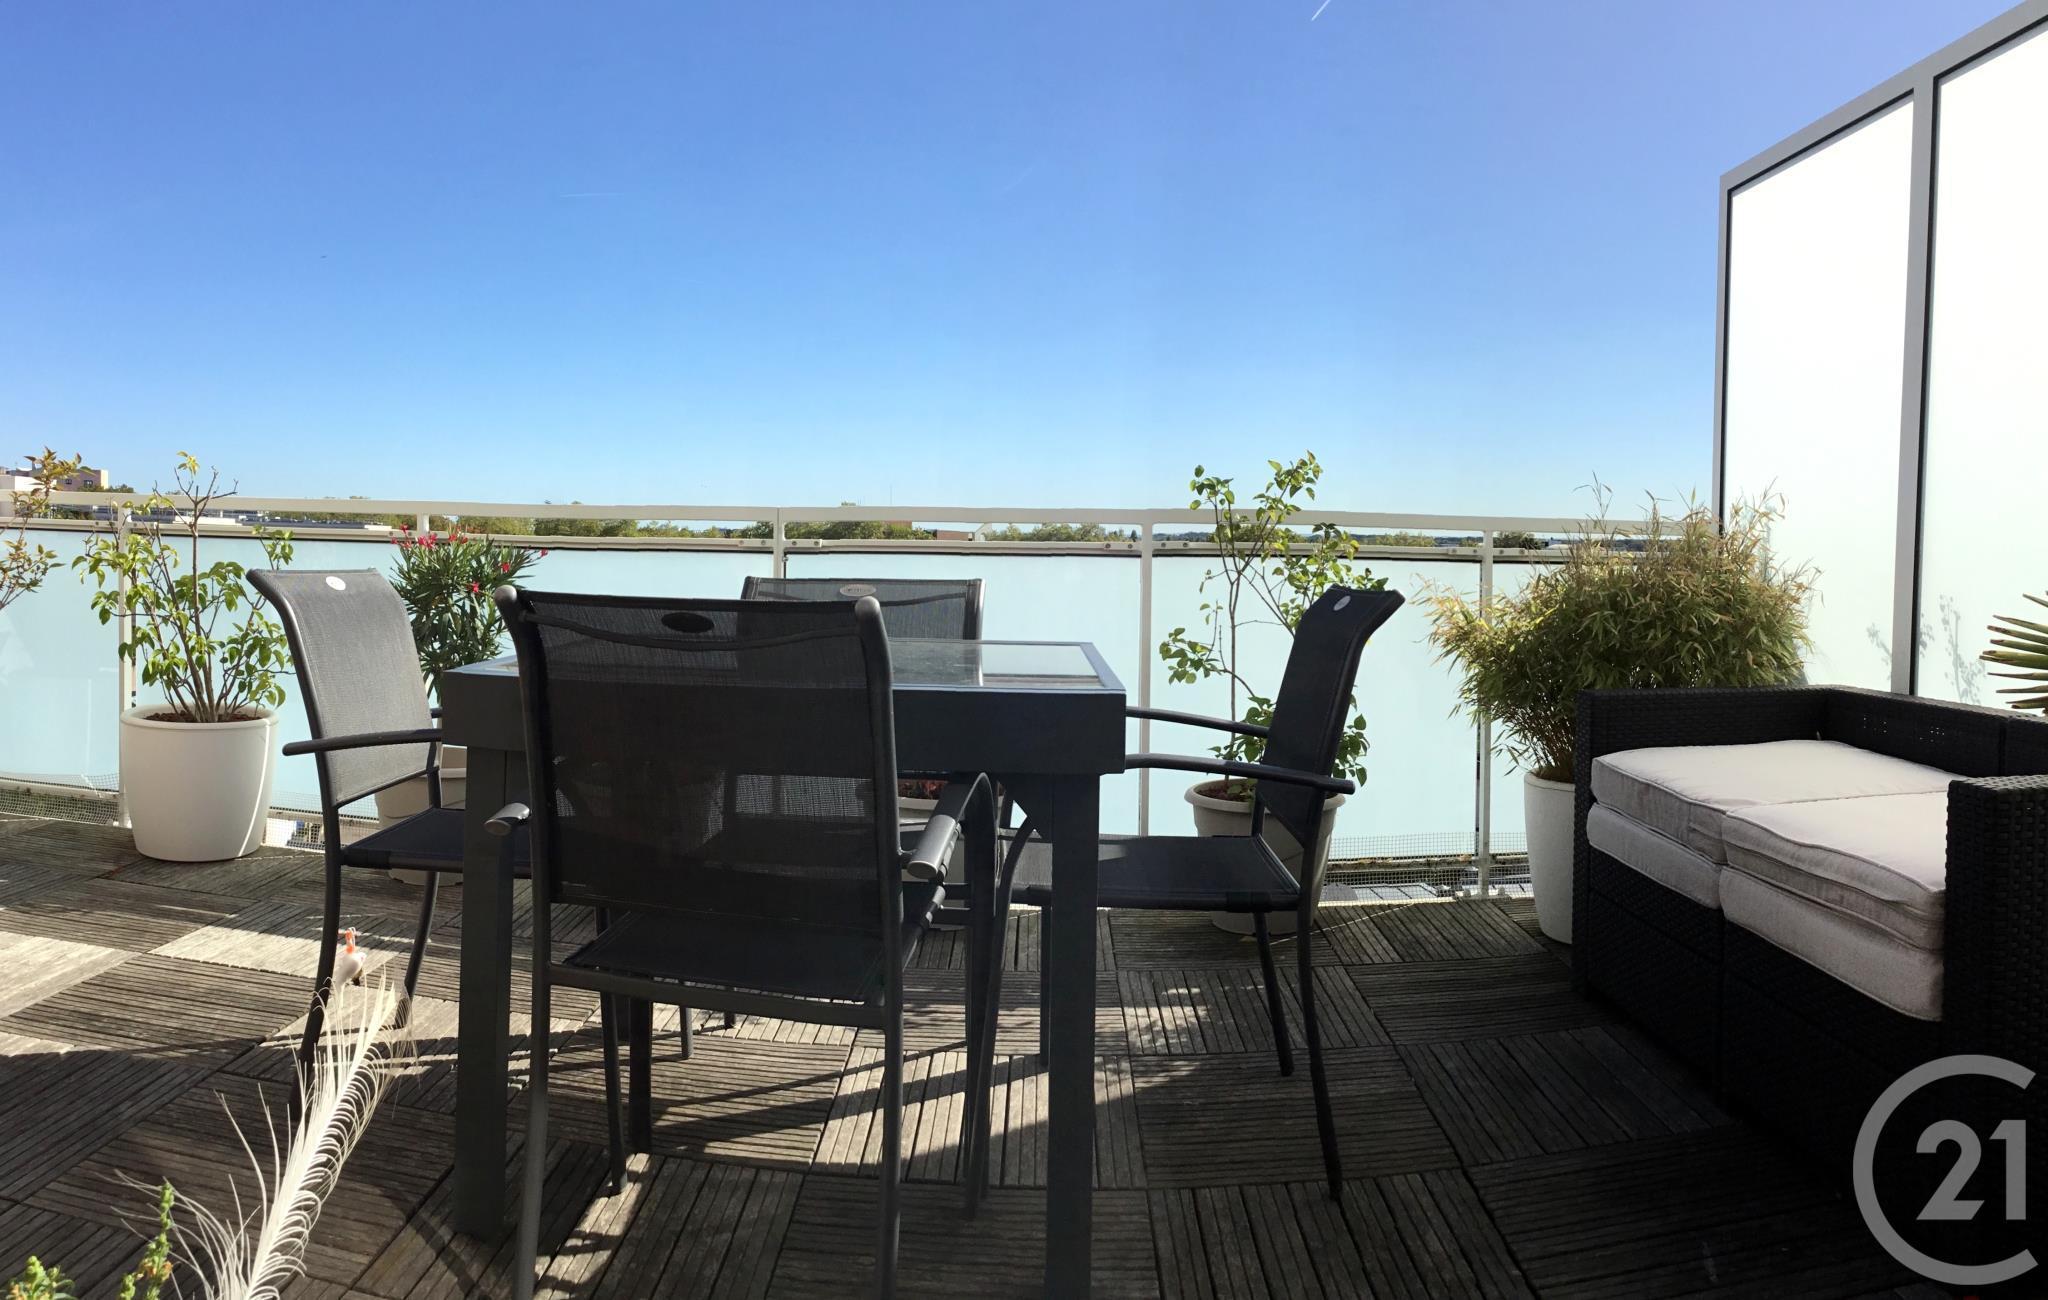 Appartement f3 3 pi ces vendre cergy 95000 ref 674916 century 21 - Appartement a vendre cergy port ...